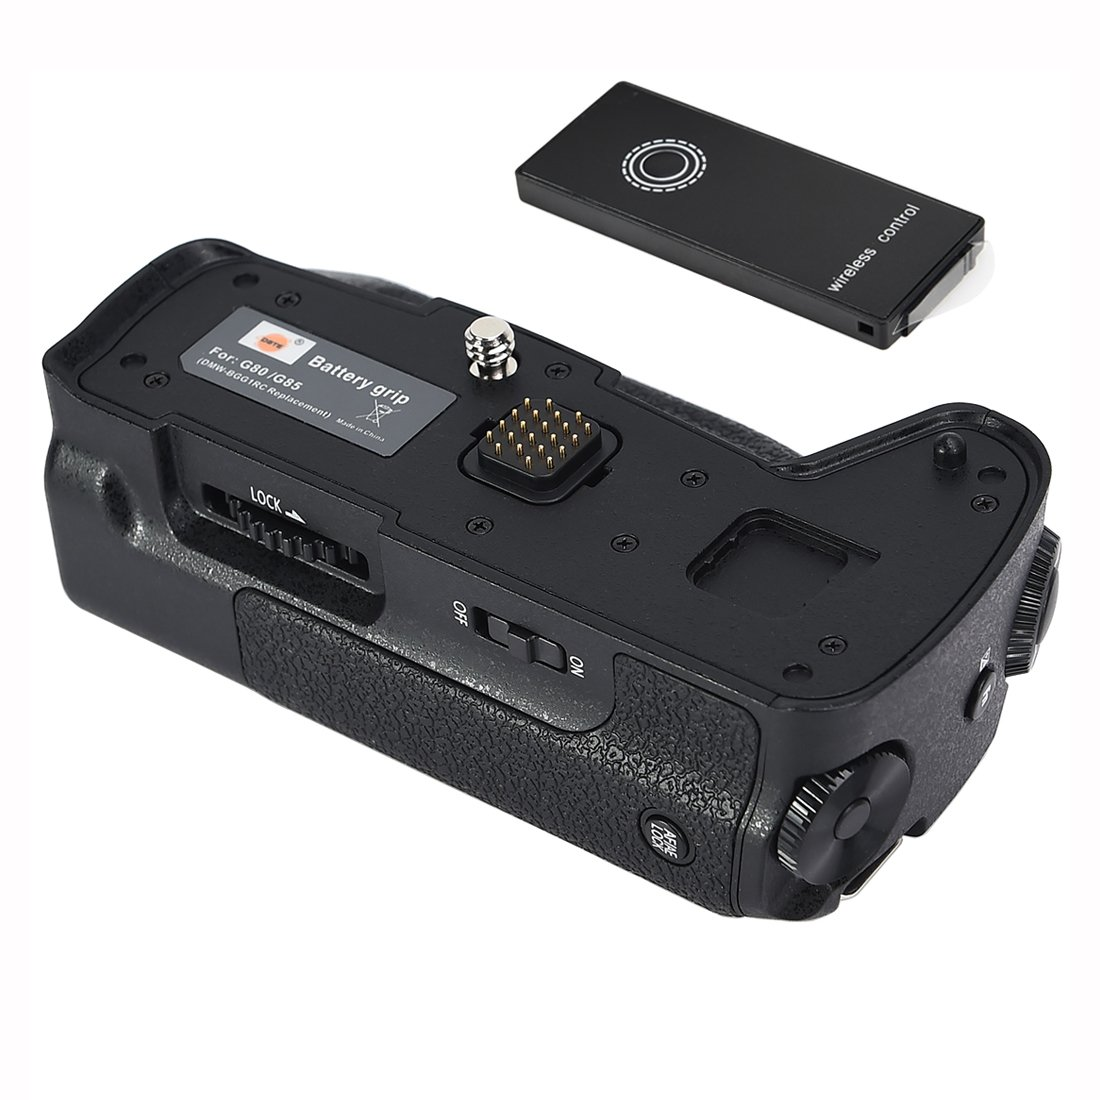 DSTE Pro Wireless Remote Control DMW-BGG1 Vertical Battery Grip for Panasonic Lumix DMC-G80 DMC-G85 G80 G85 Digital Camera as DMW-BLC12